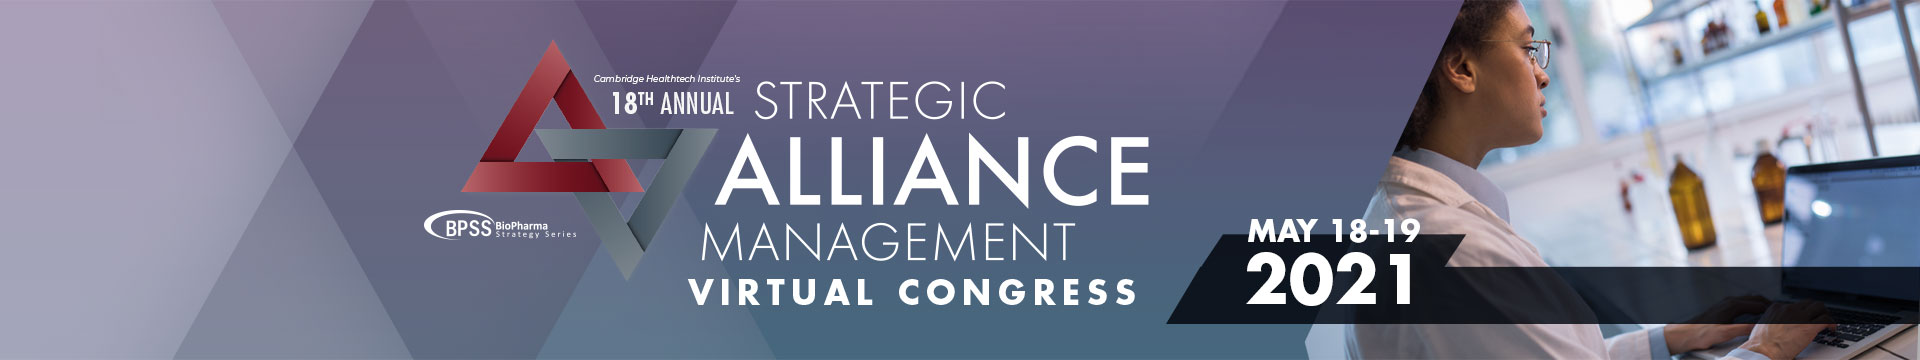 2021 CHI Strategic Alliance Management Virtual Congress image